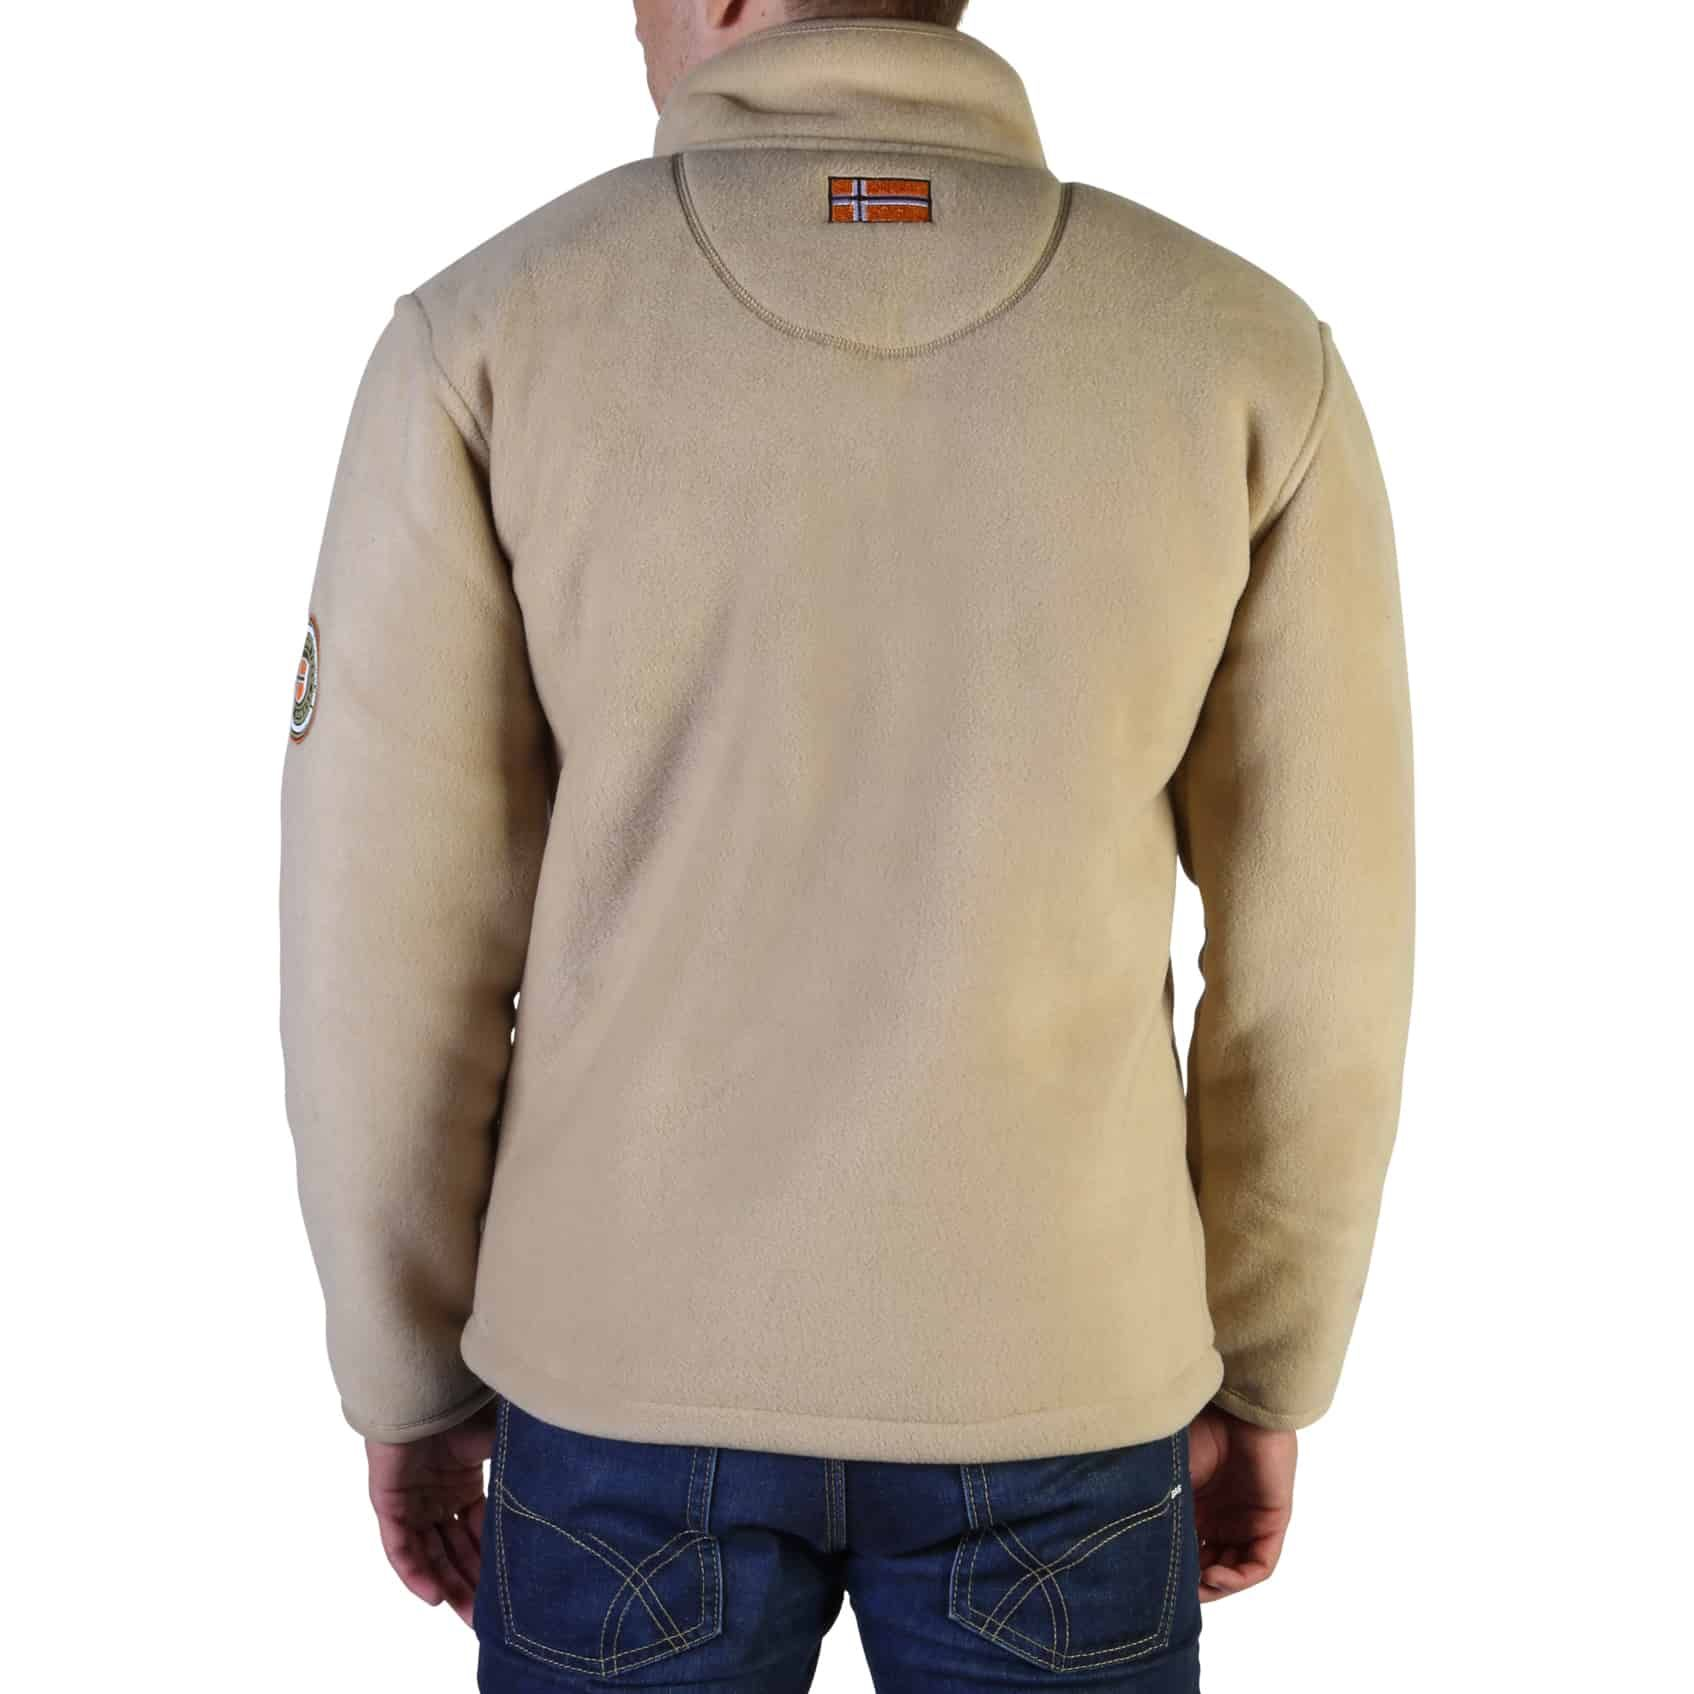 Sweat-shirts Geographical Norway – Usine_man